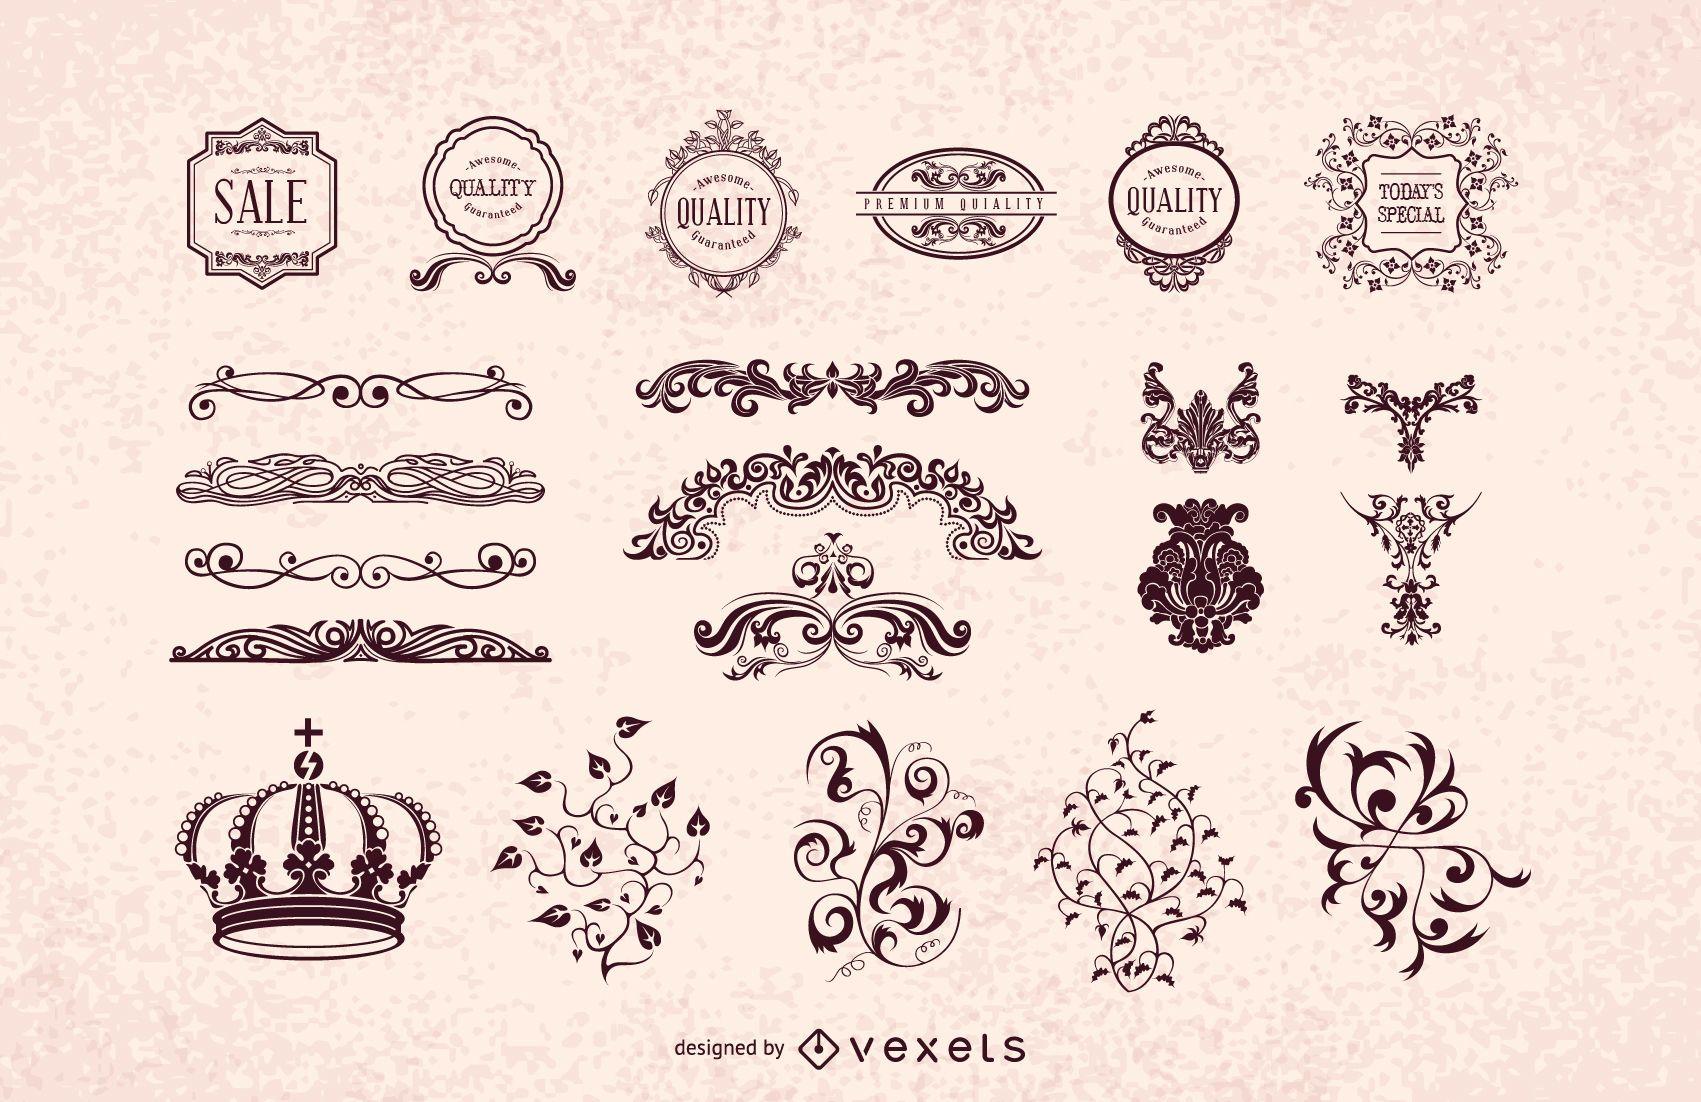 Vintage Heraldic Decorative Ornament Pack